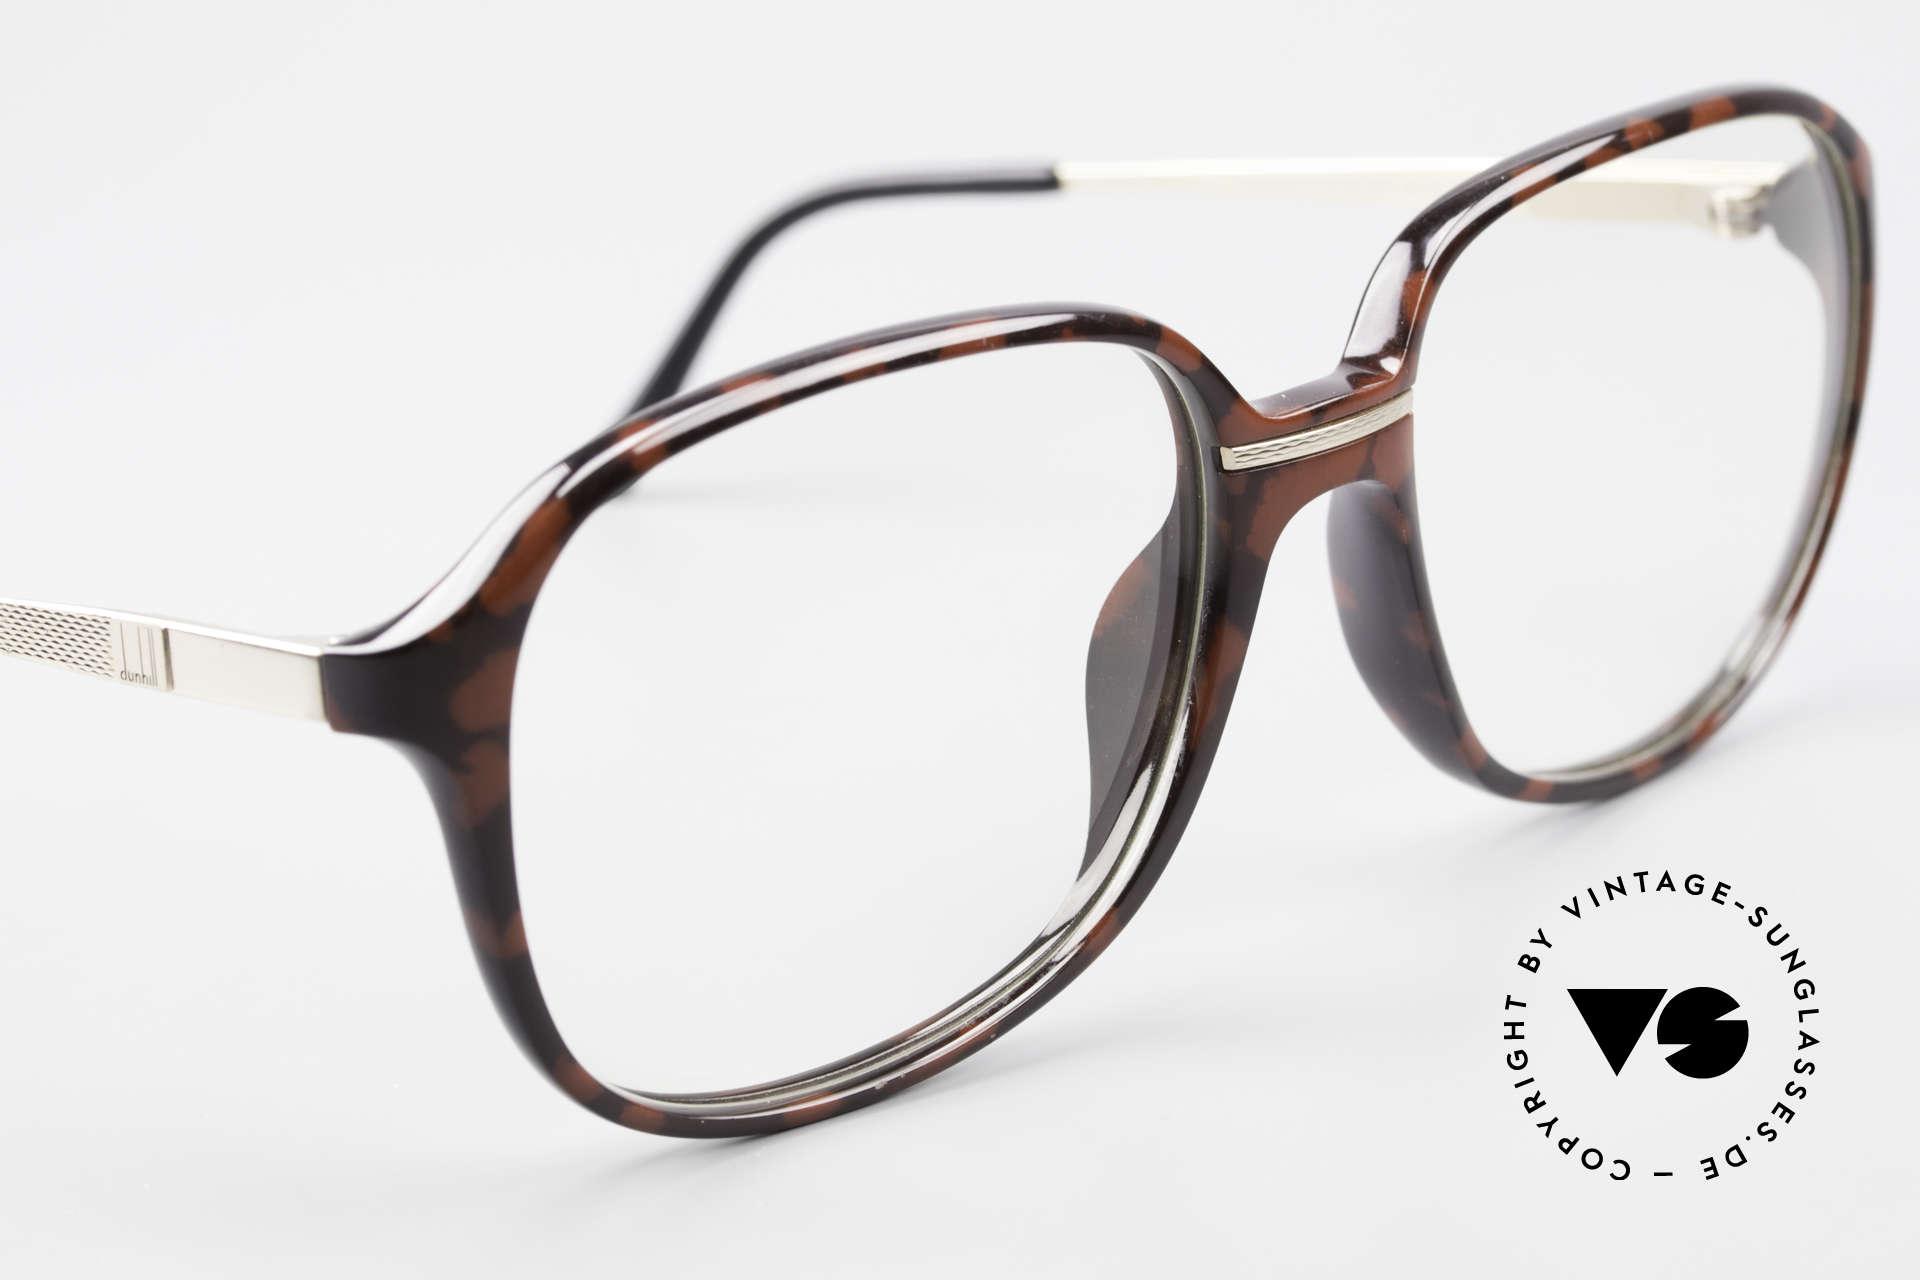 Dunhill 6137 90's Vintage Optyl Eyeglasses, new old stock (like all our vintage designer eyewear), Made for Men